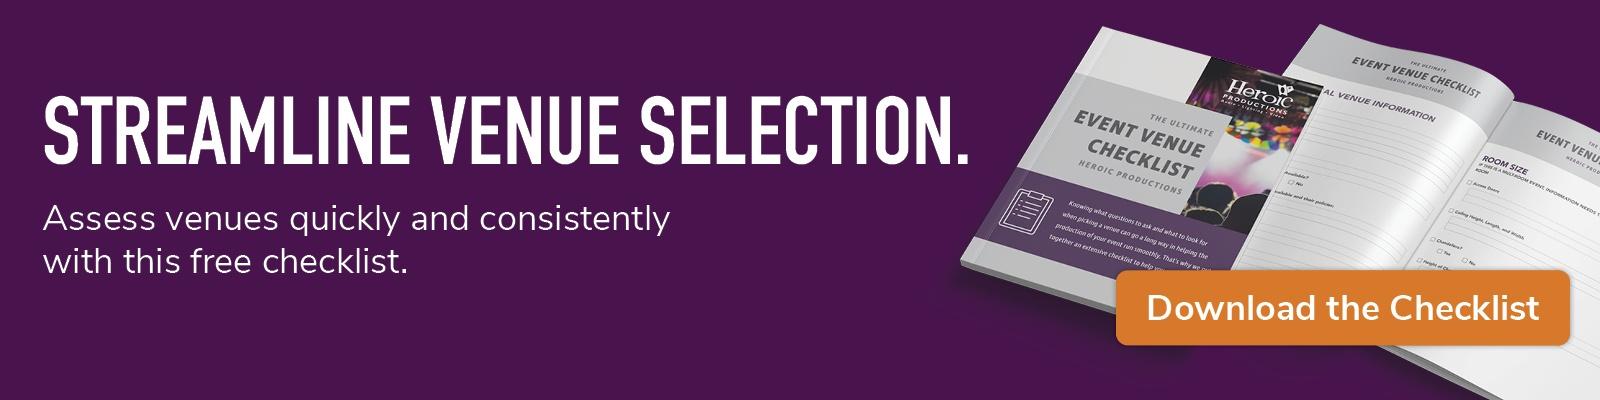 streamline venue selection; download the checklist